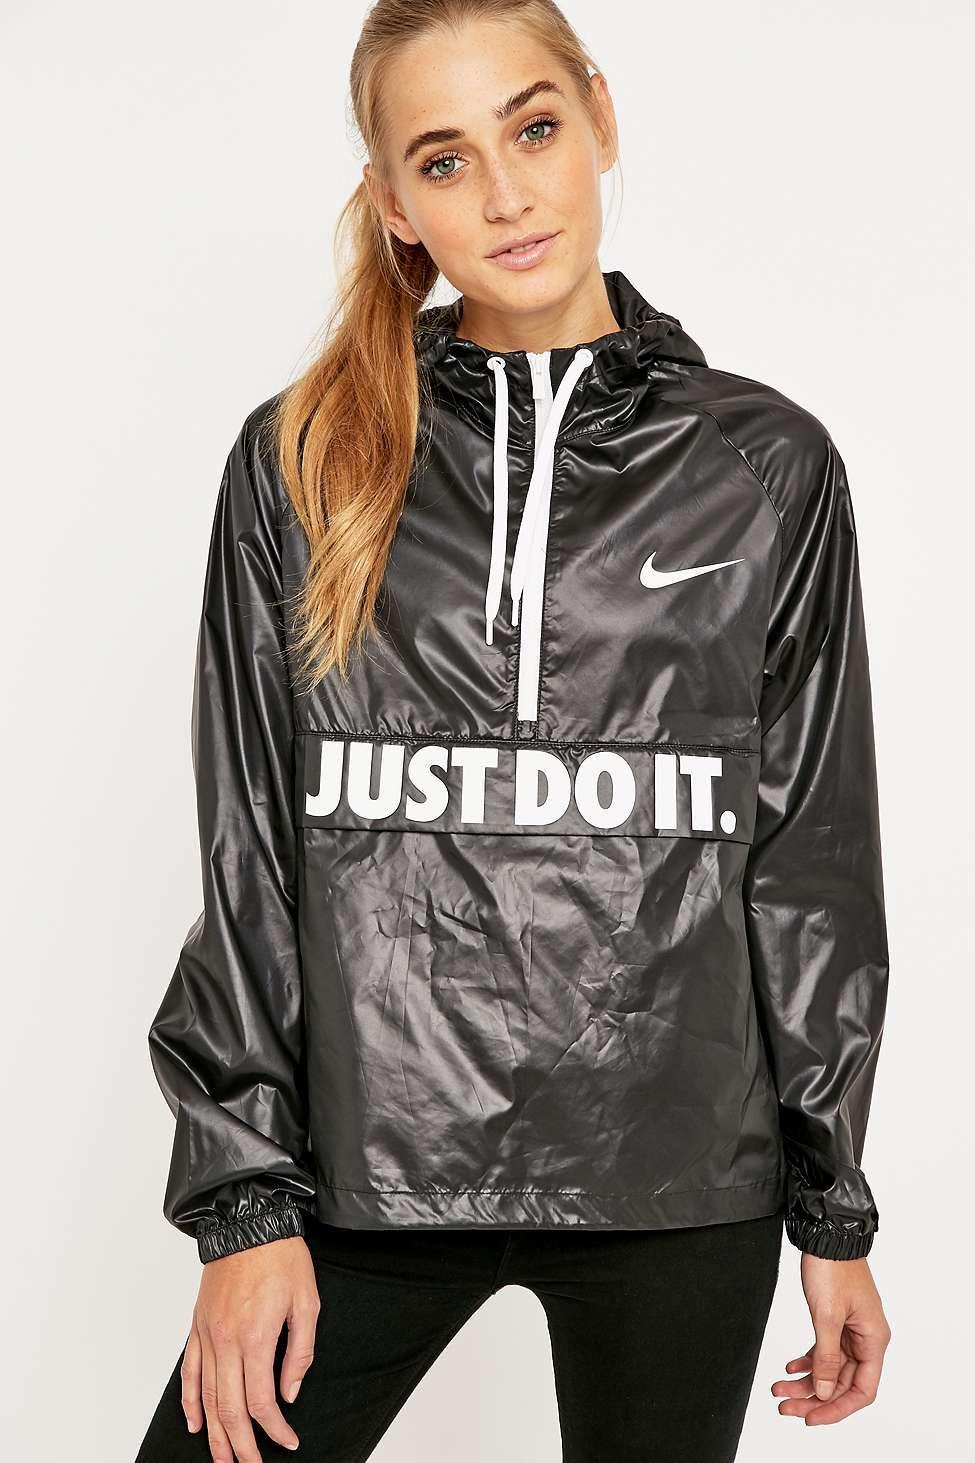 e169c2d3 Women's Black City Packable Jacket | Shiny nylon | Jacken ...